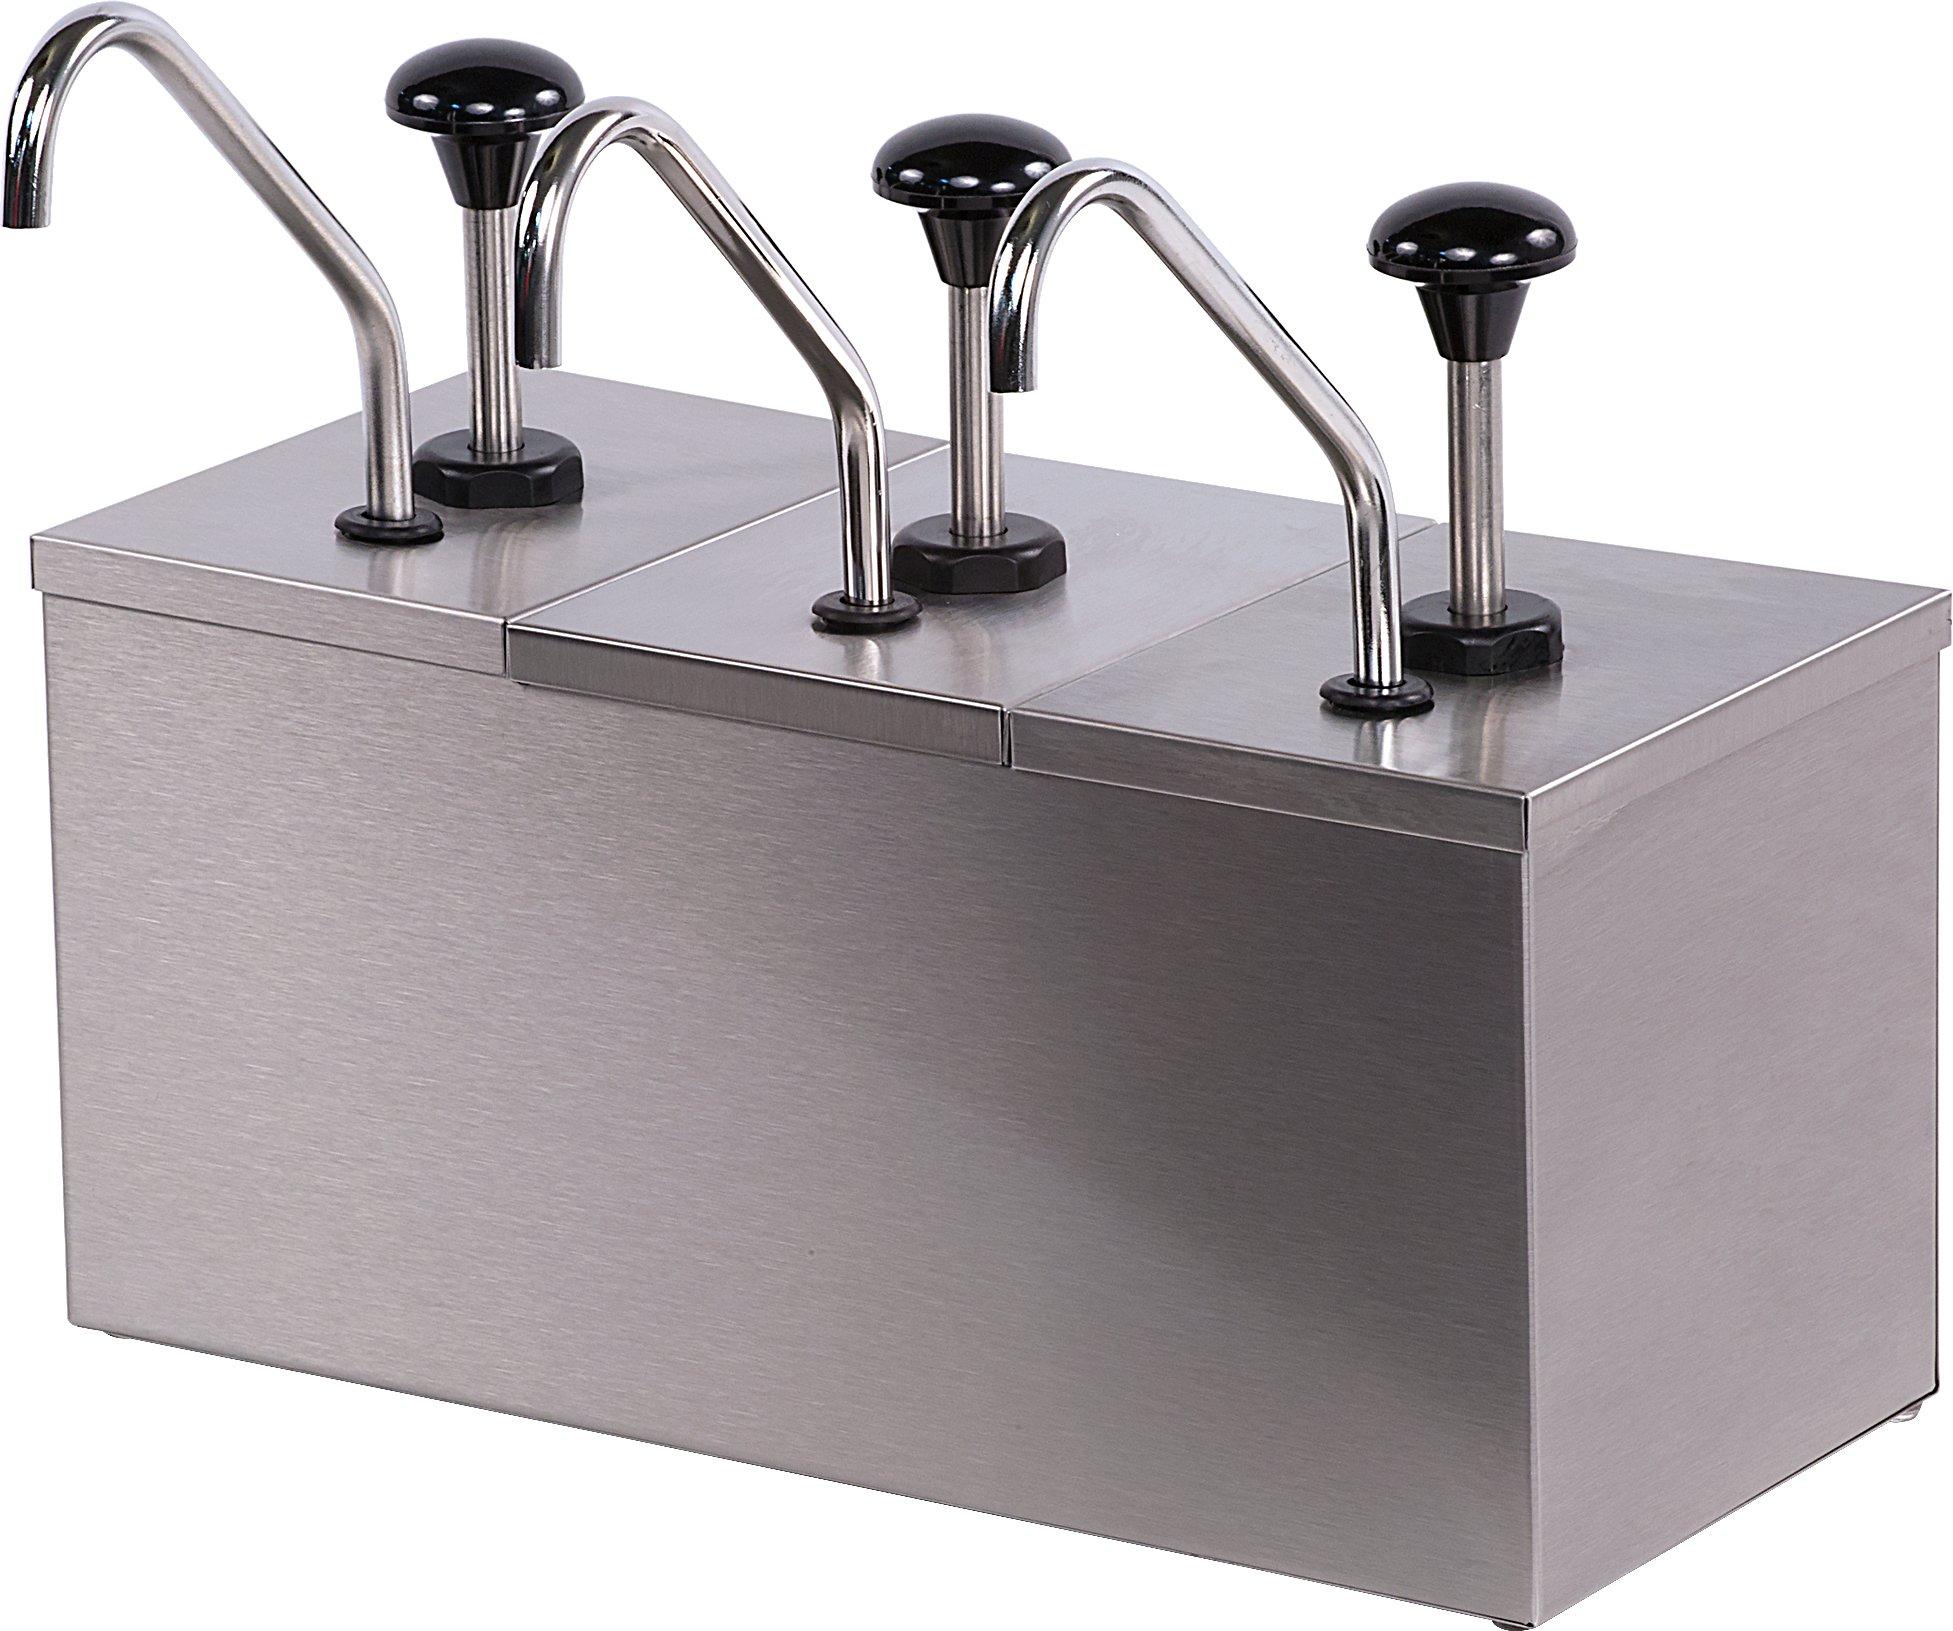 Carlisle 386230IB Insulated Triple Condiment Pump Station with 2 Quart Jars